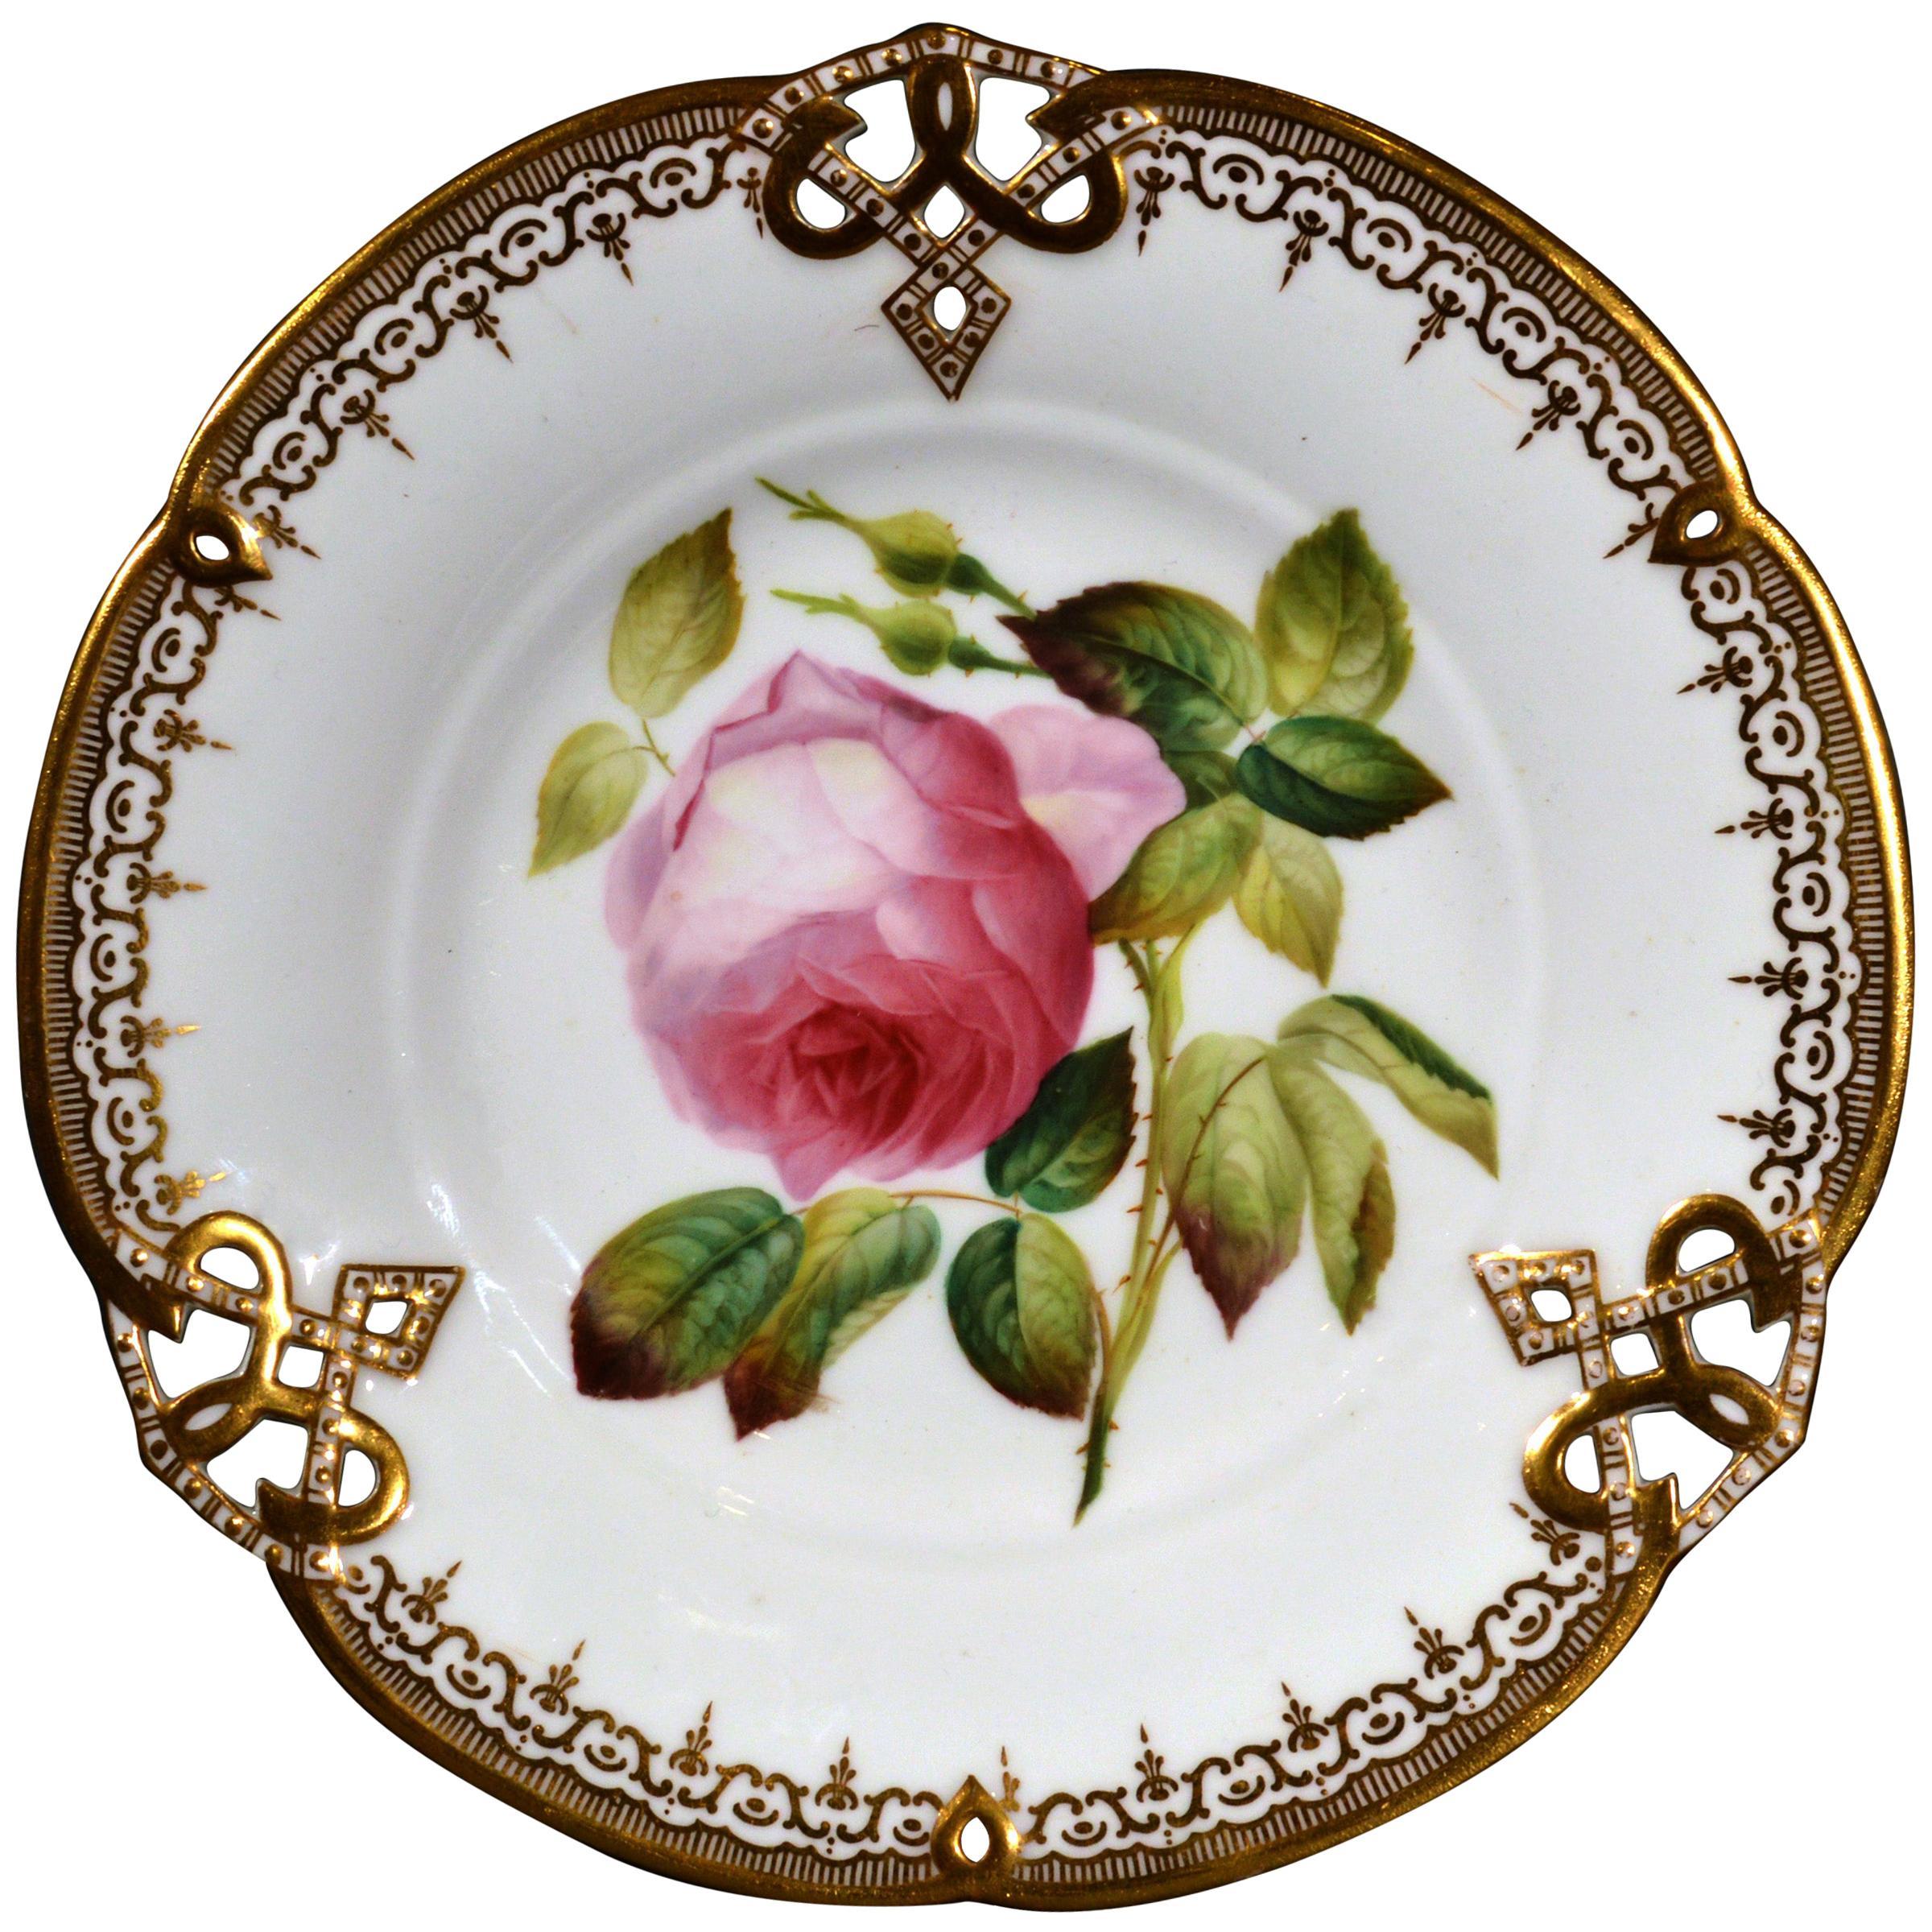 Minton Bone China Porcelain Botanical Specimen Plate of a Rose, Pattern #9762